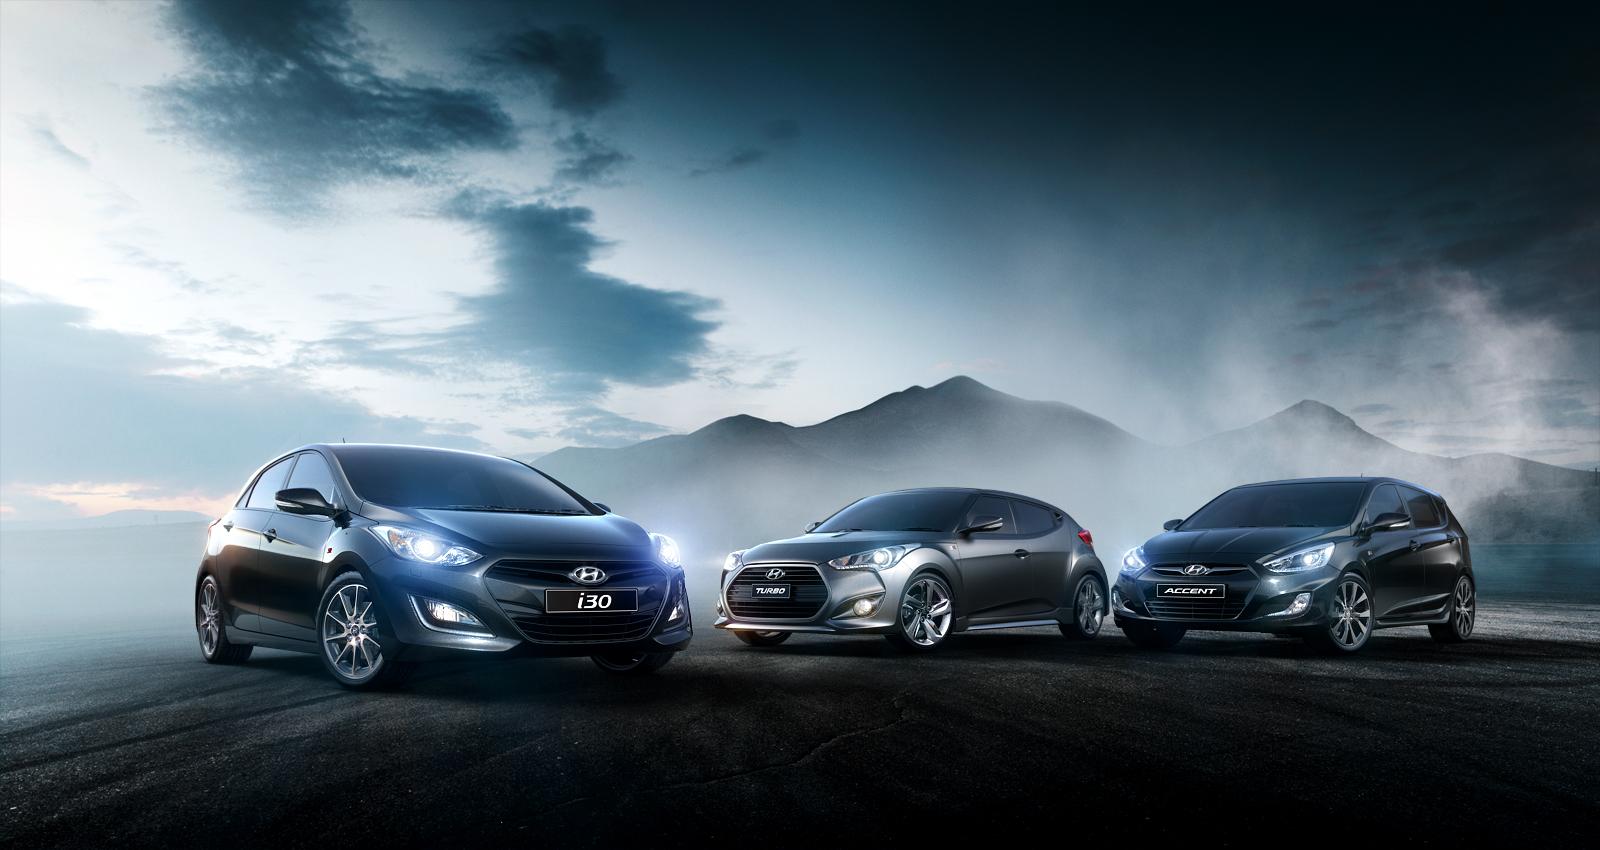 Hyundai SR lineup by subaqua